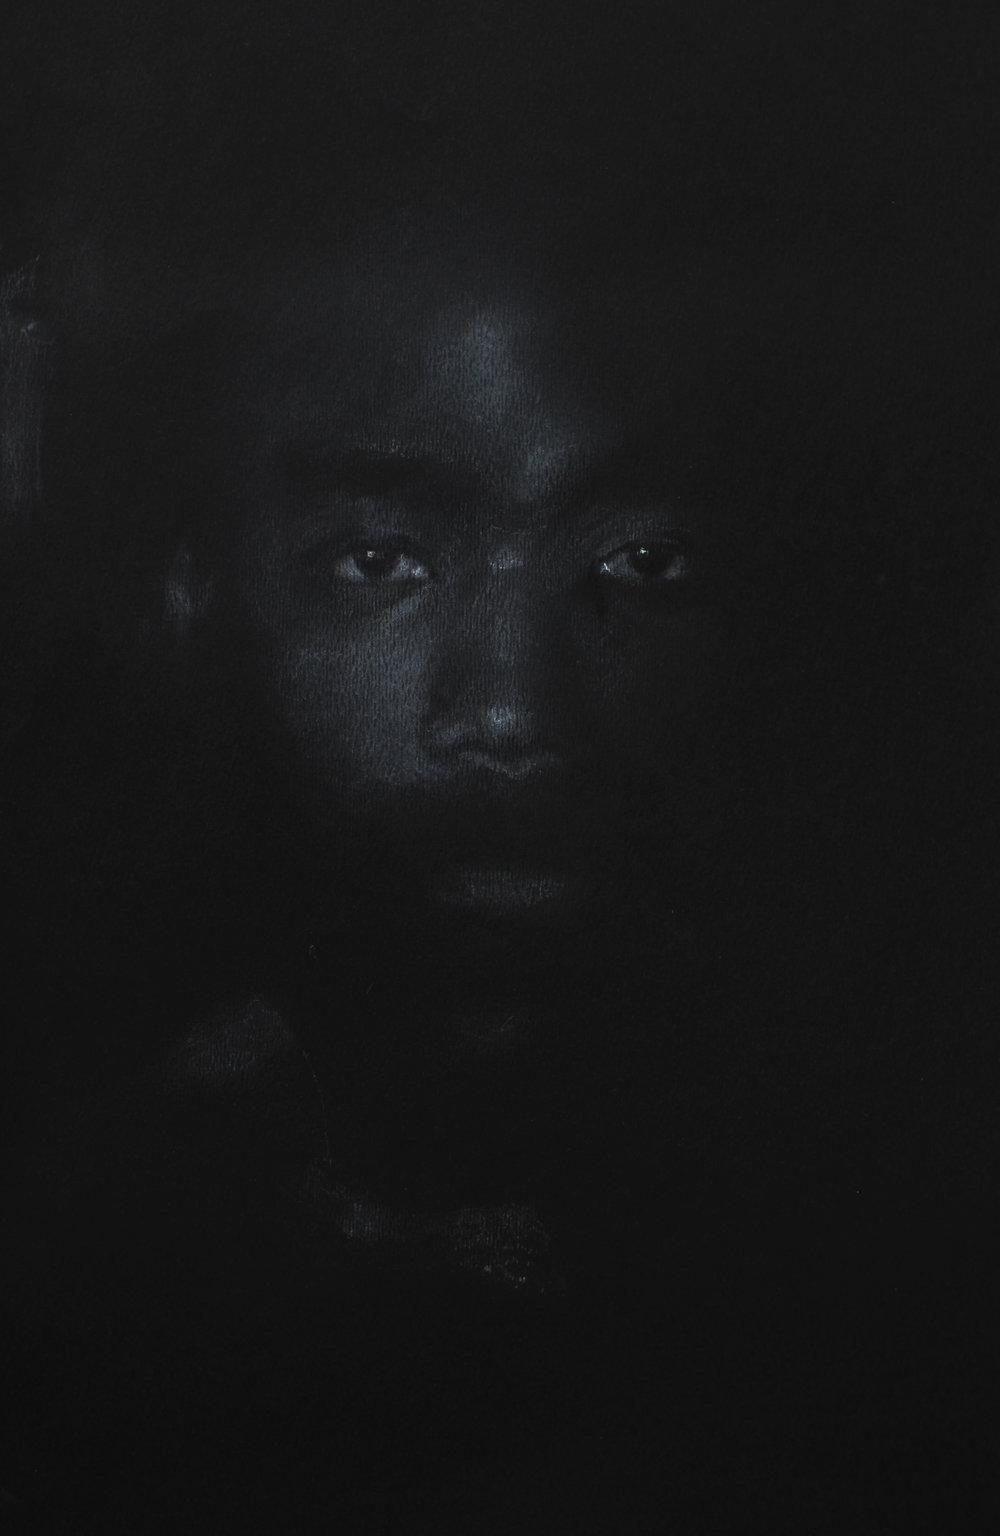 Gambino, chalk on cotton paper, 20x12